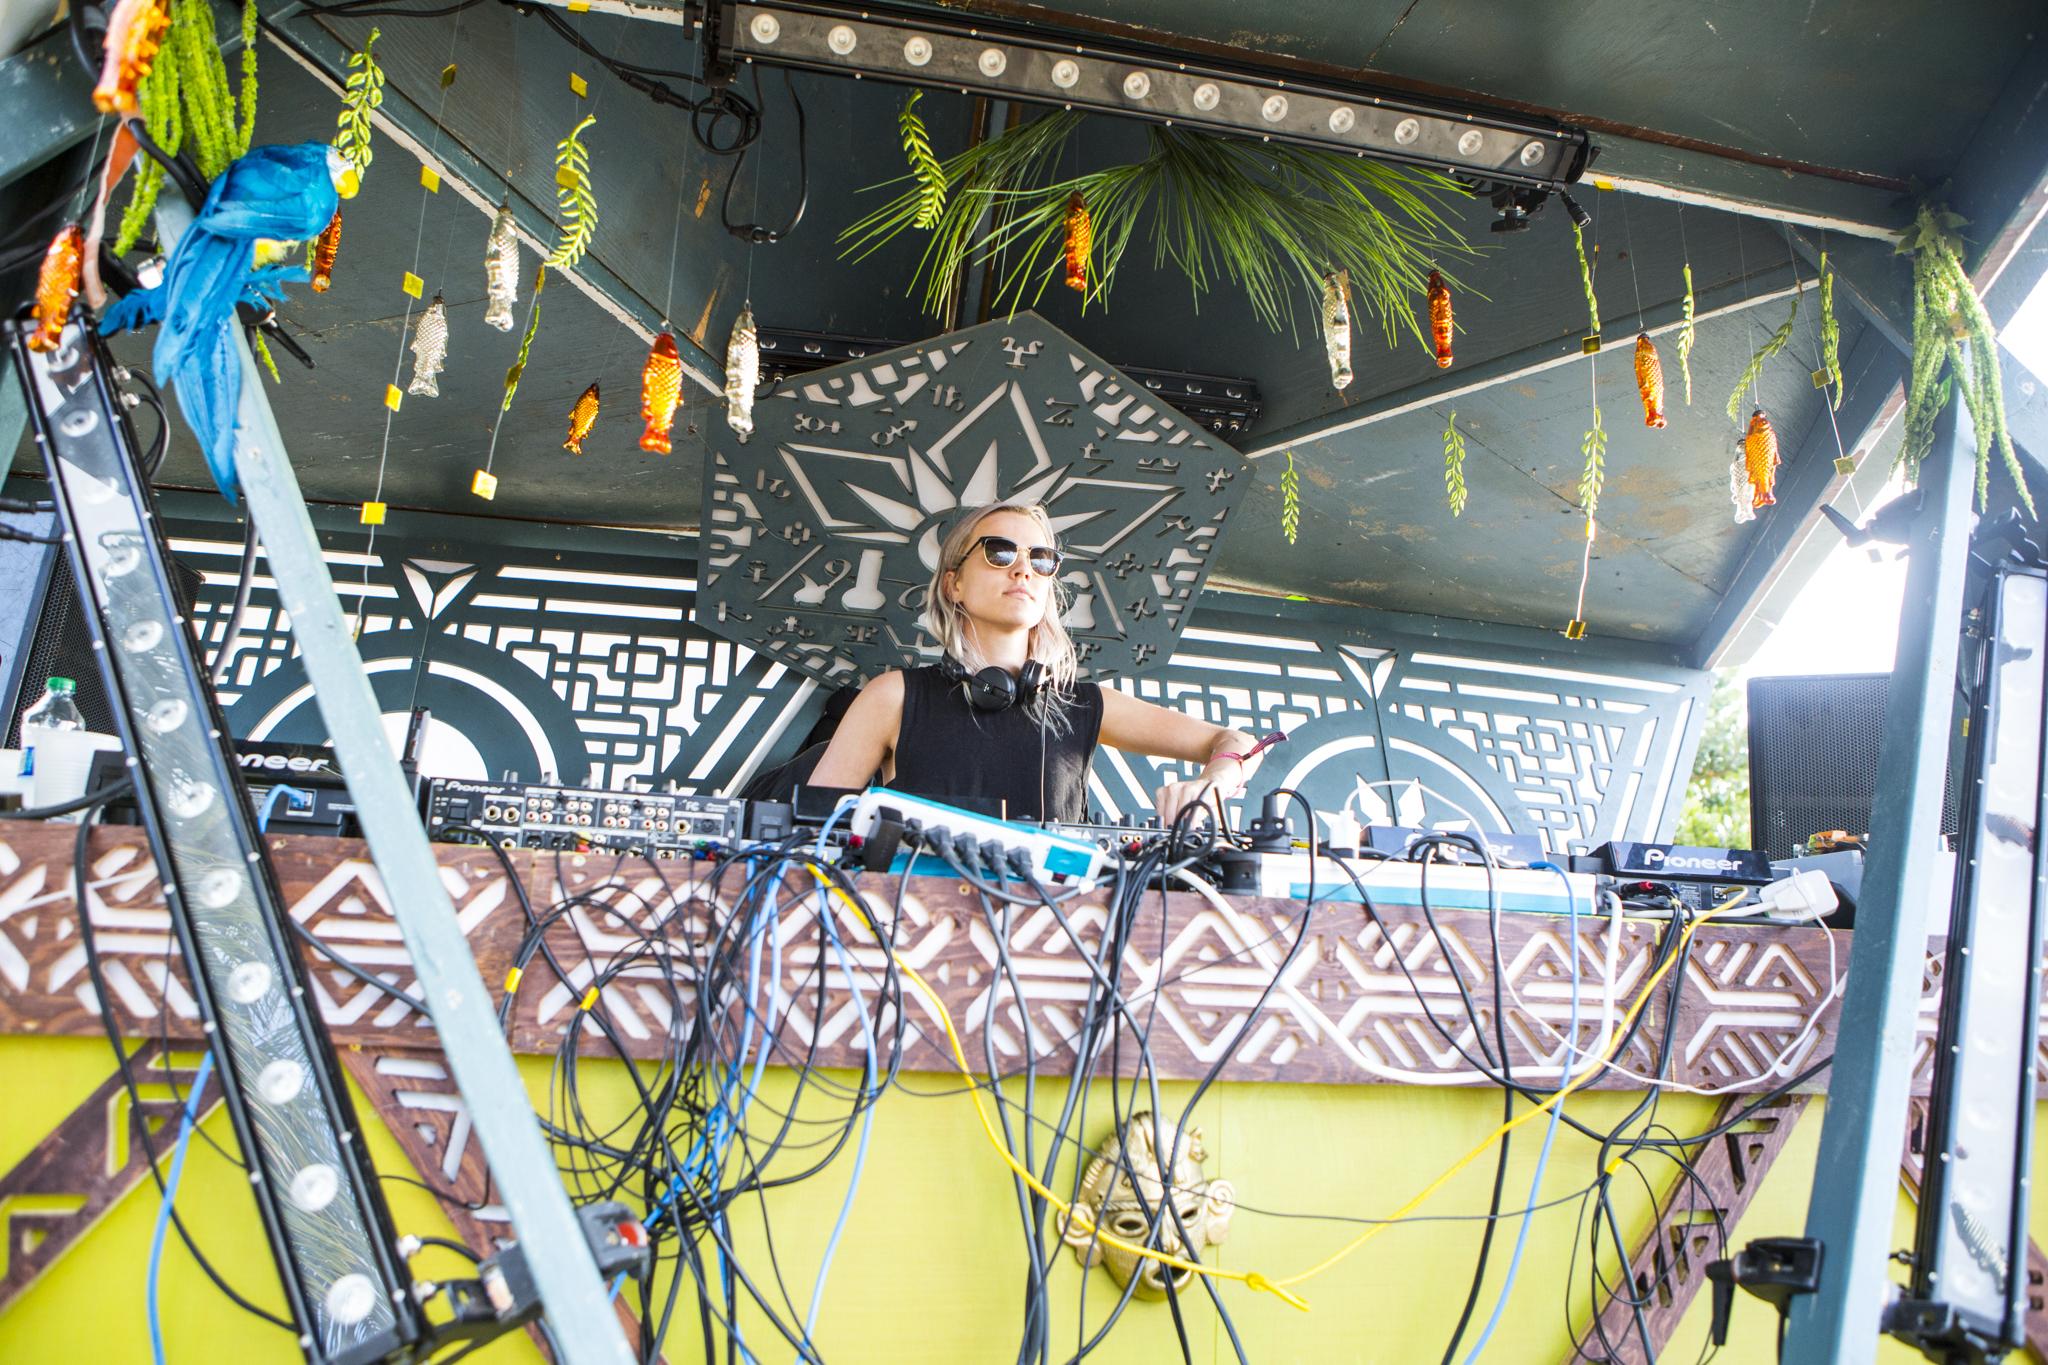 SXM Festival 2017 // Photo by Philip Cosores